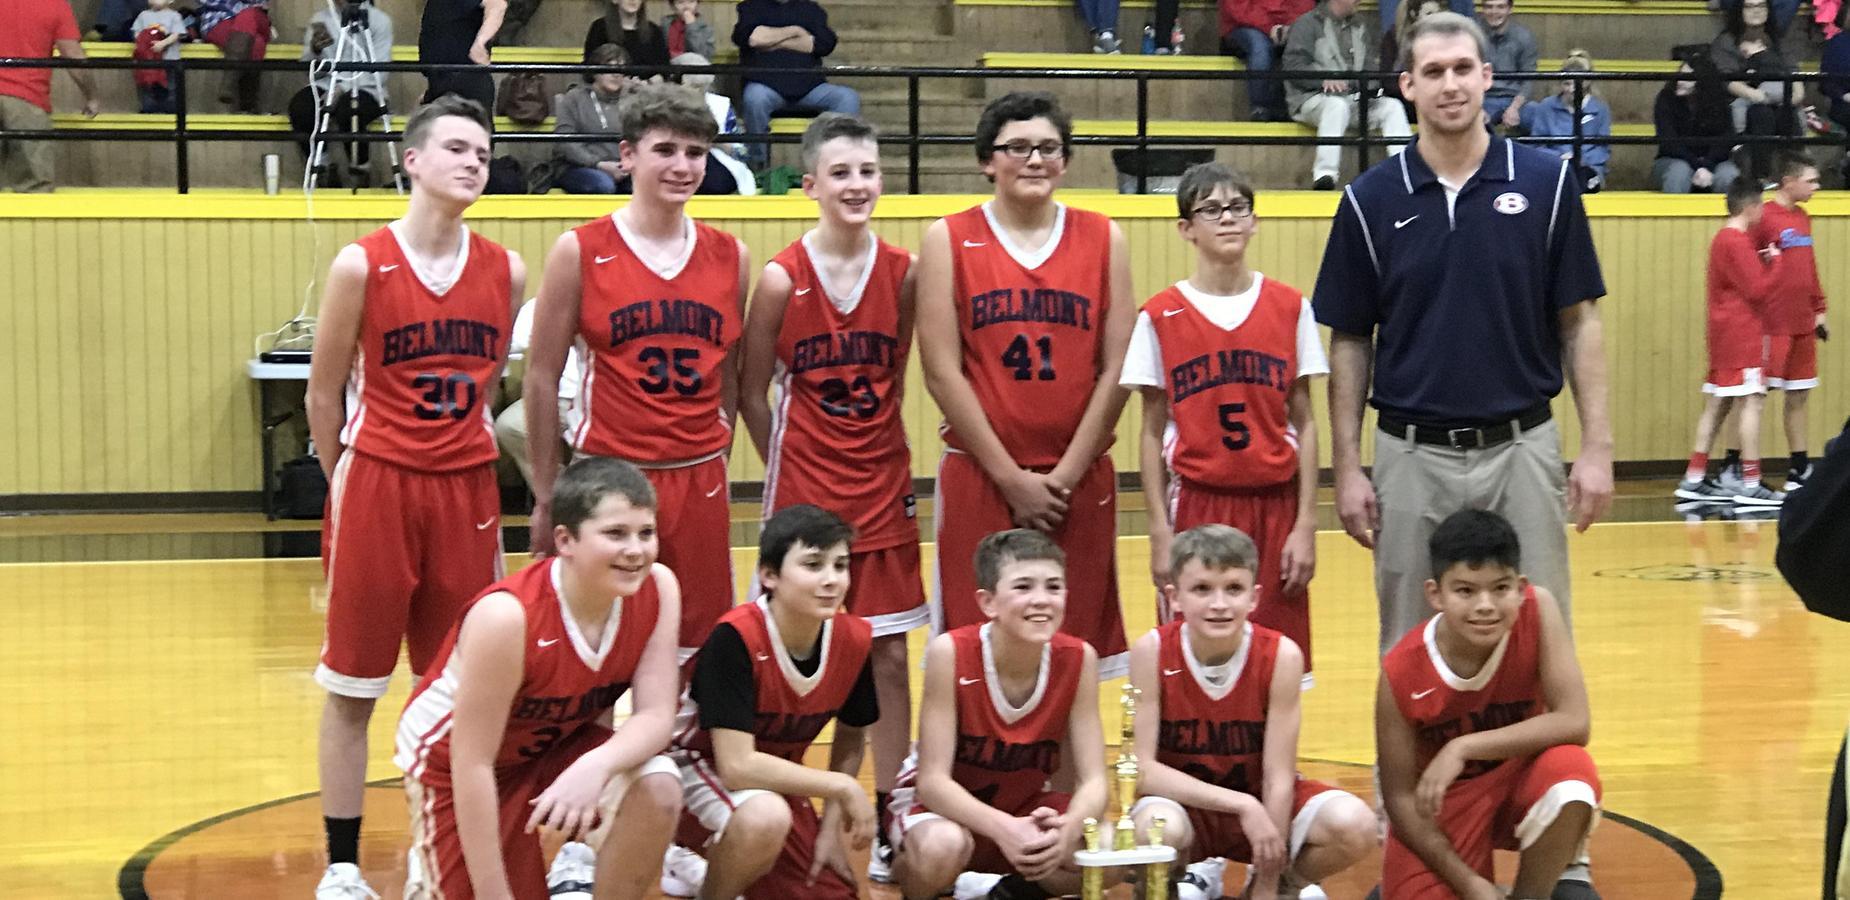 Belmont Boys win 7th Grade County Tournament